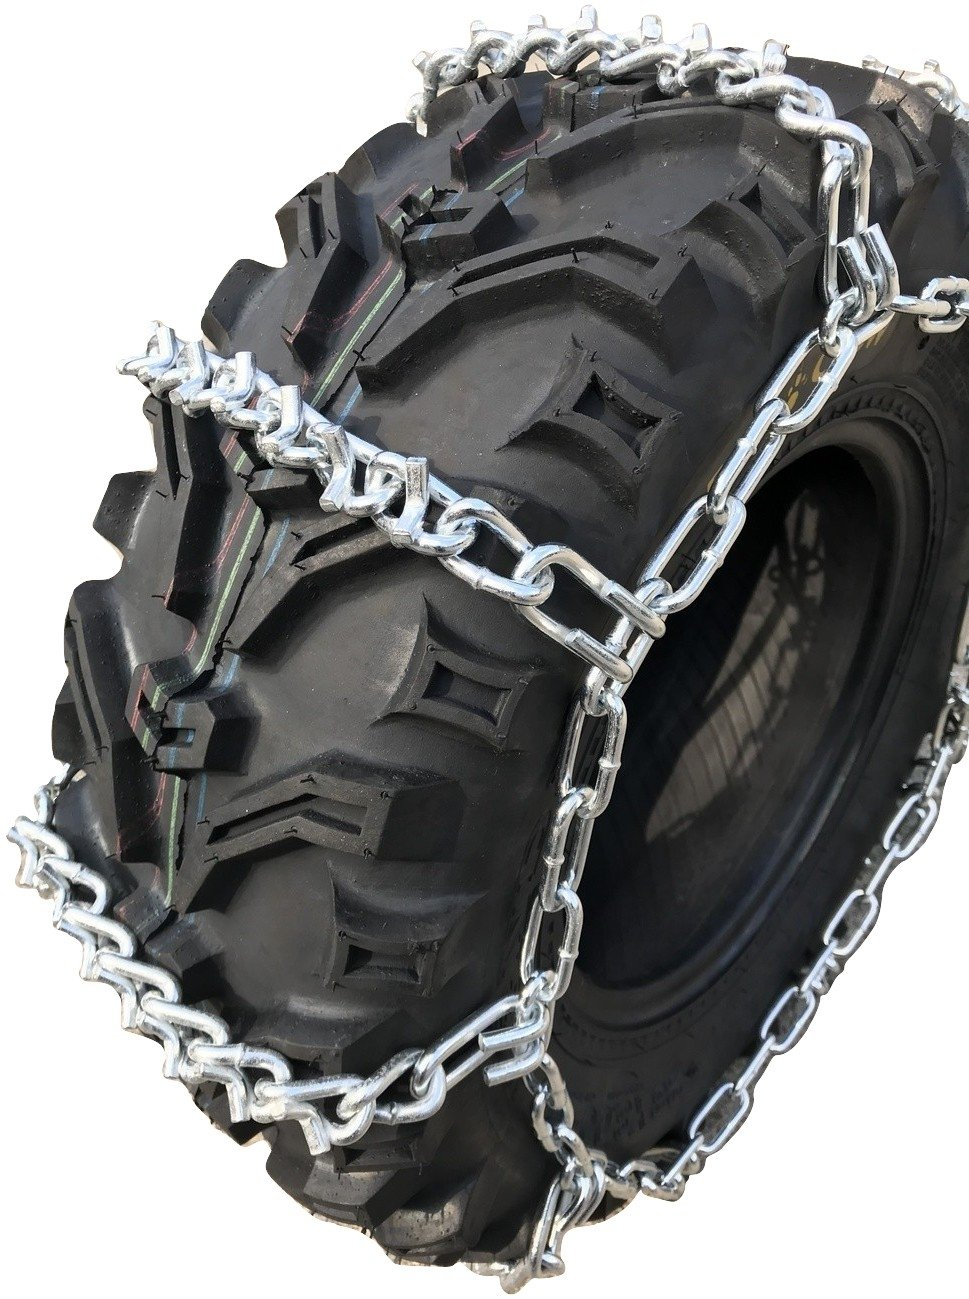 TireChain.com ATV UTV 4-Link, Tire Chains 812 V Bar 23x10-12, 24x11-11, 25x8-10, 25x8-11, 25x8-12, 26x8-12, Priced per Pair